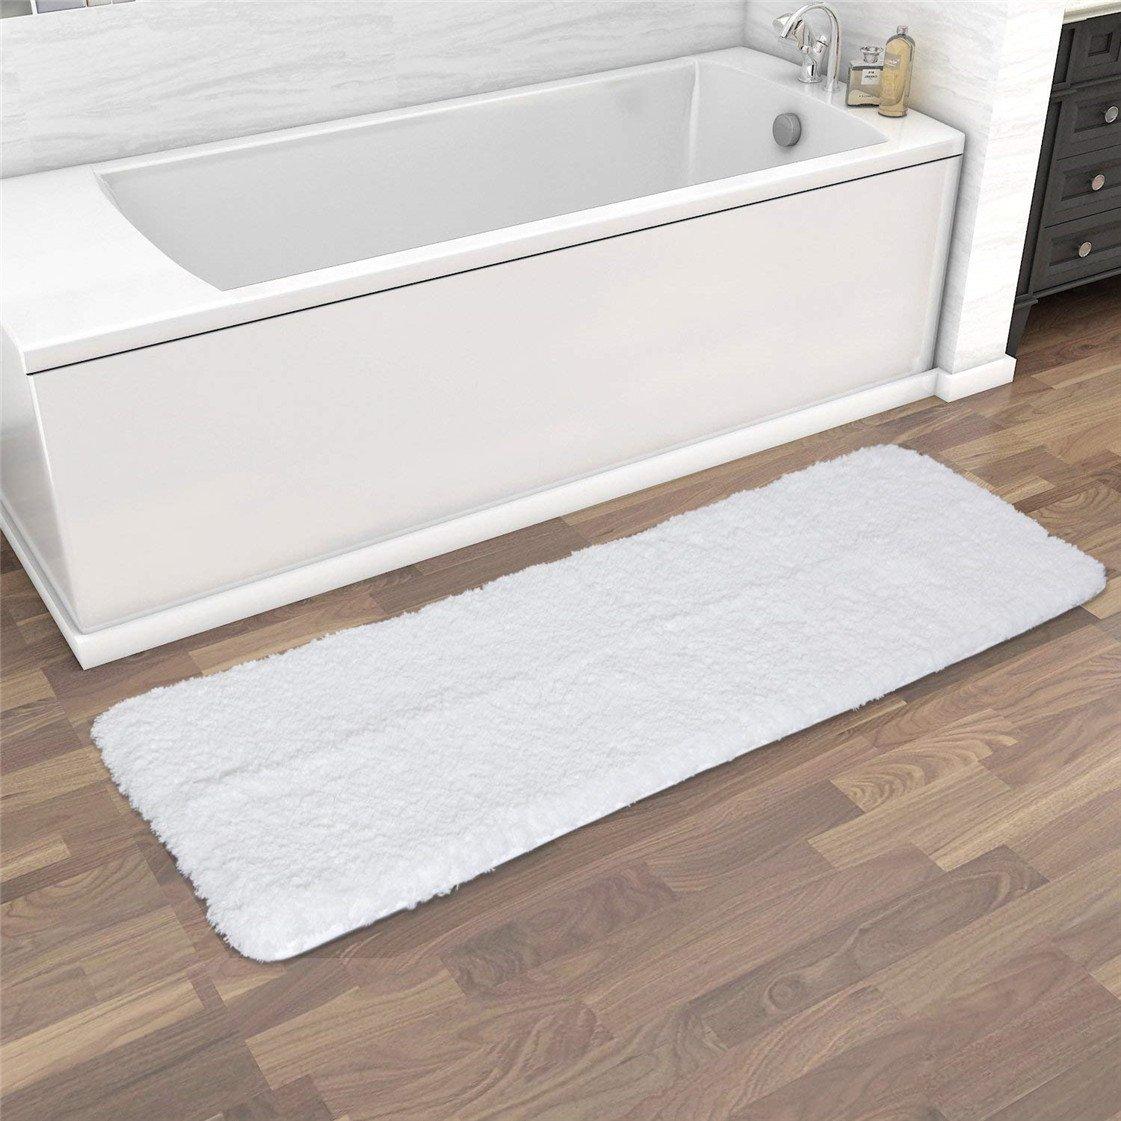 Bathroom Rug, Soft Microfiber Non-Slip Long Rubber Bath Rug Anti- Bacterial Mats (47'' Length x 18'' Width) - Machine Washable, White